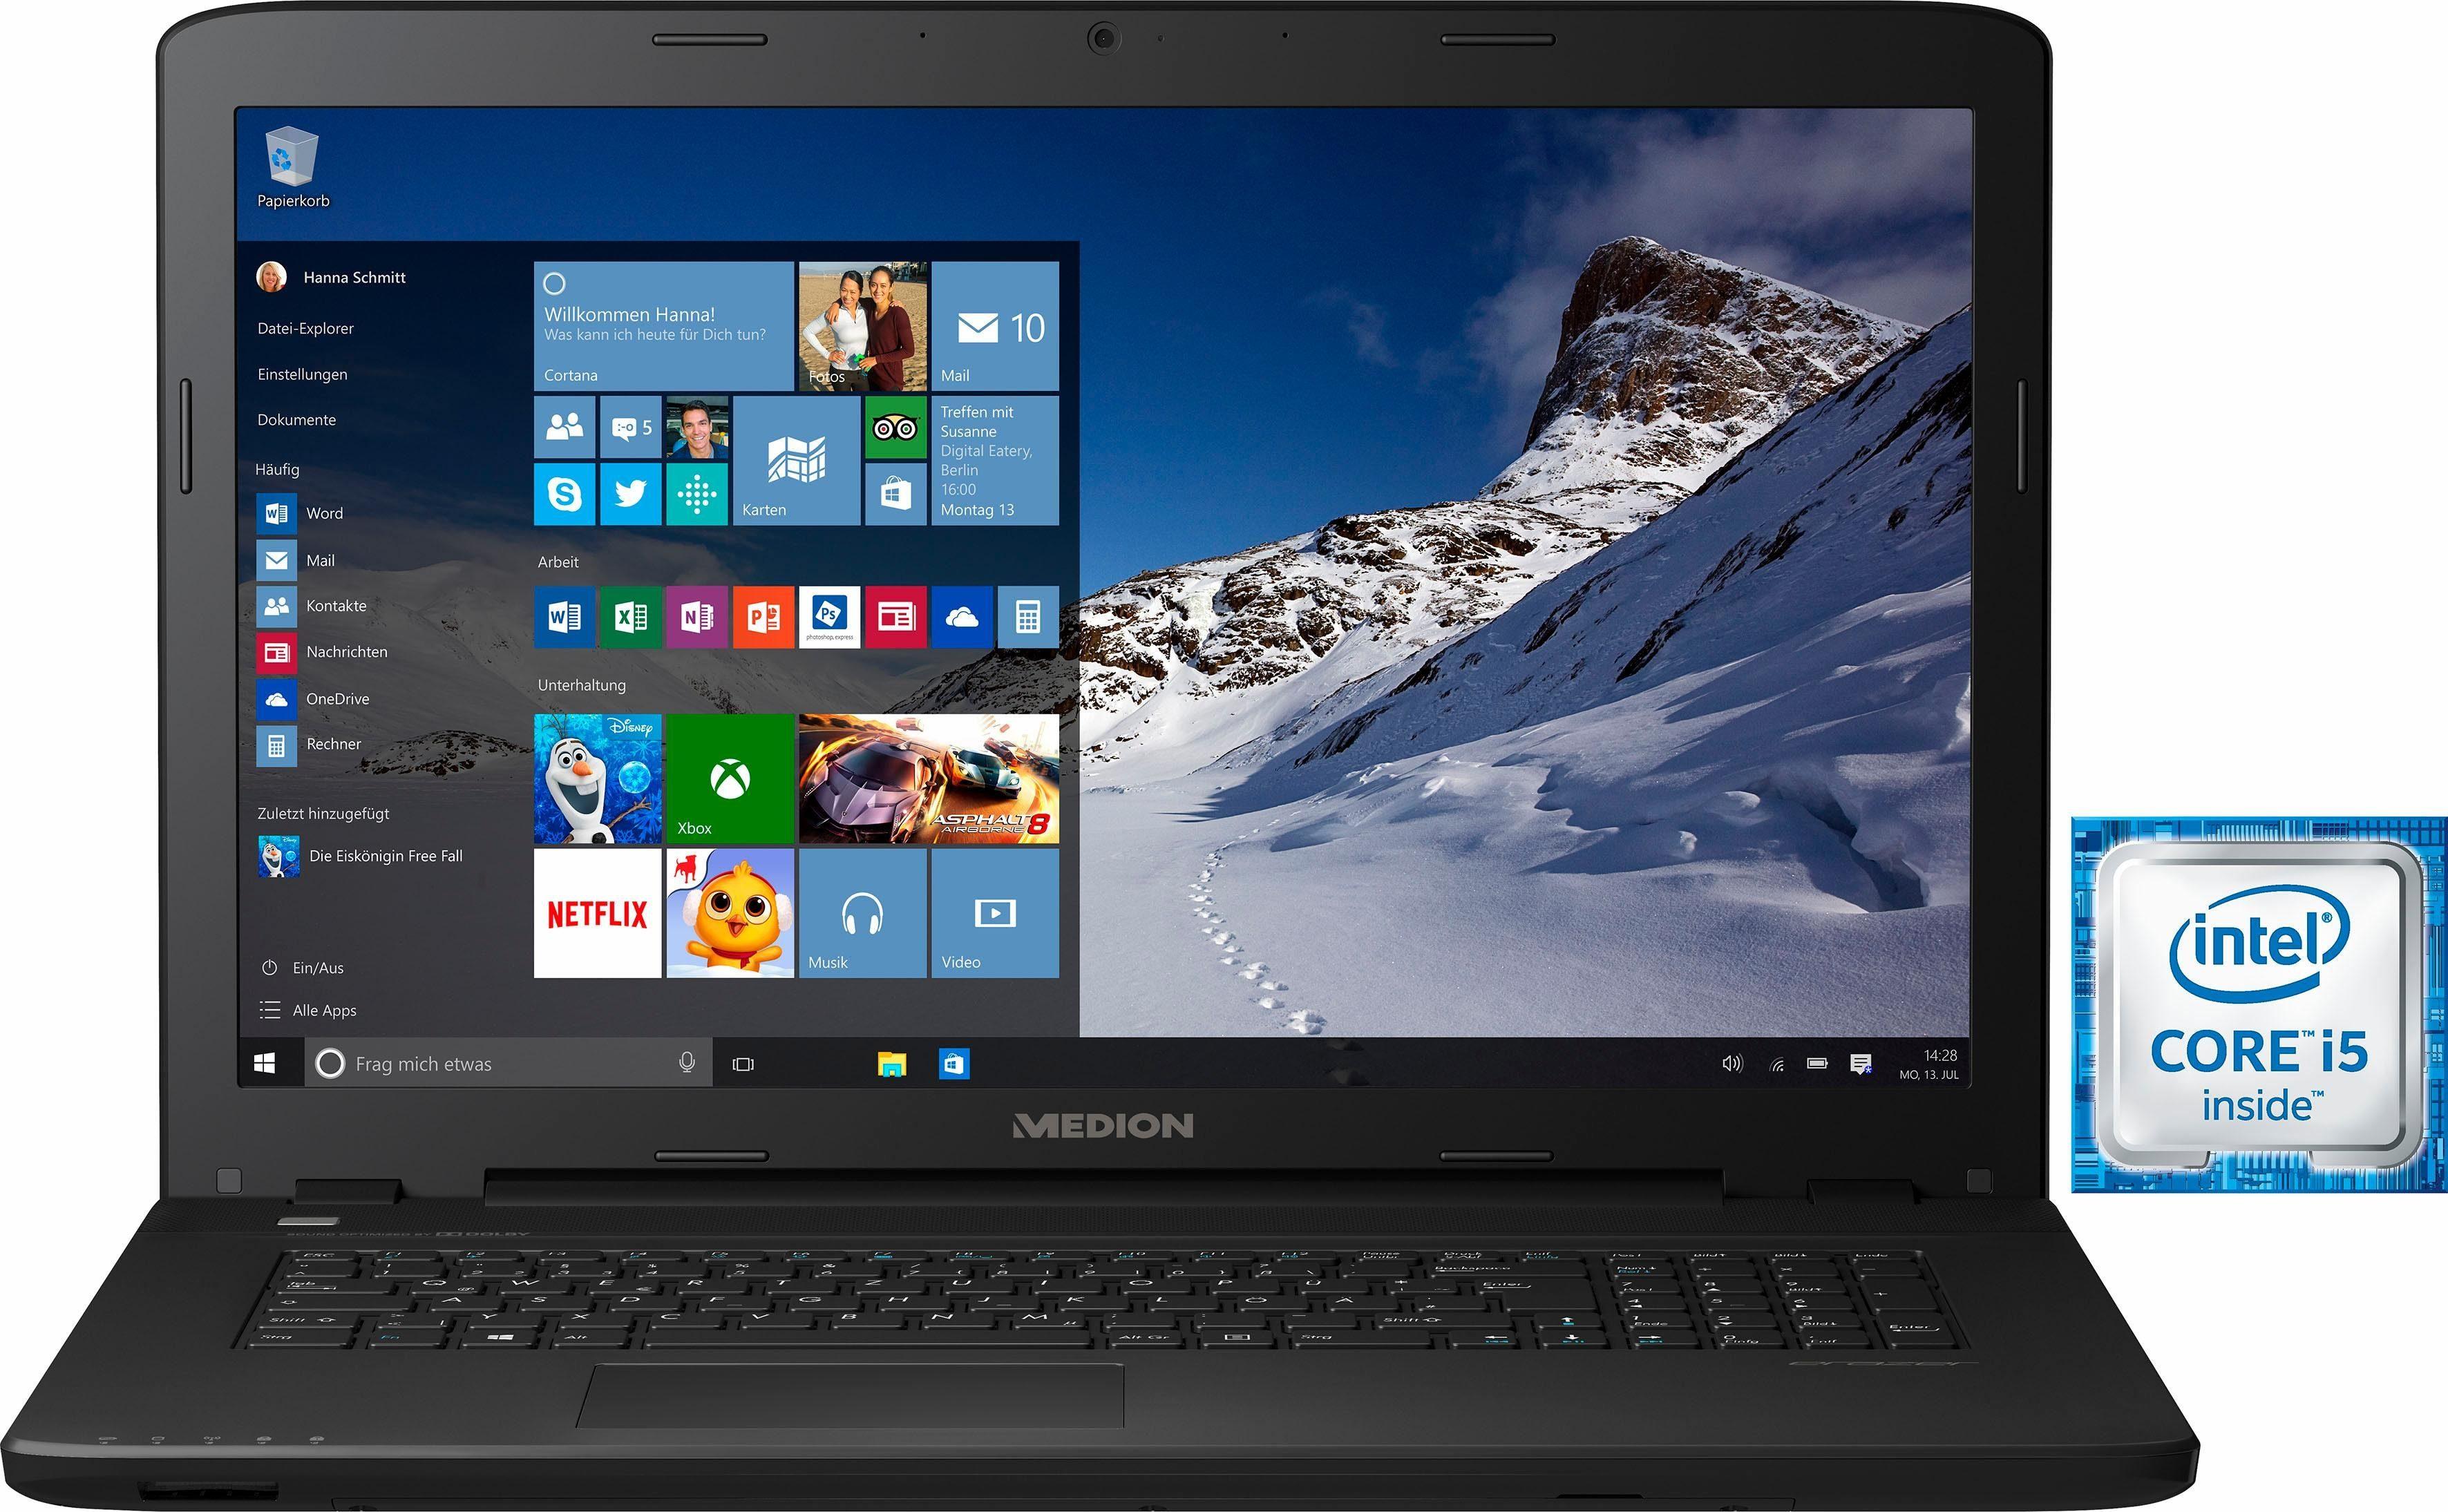 Medion® P7643 Notebook, Intel® Core™ i5, 43,9 cm (17,3 Zoll), 8192 MB DDR3-RAM